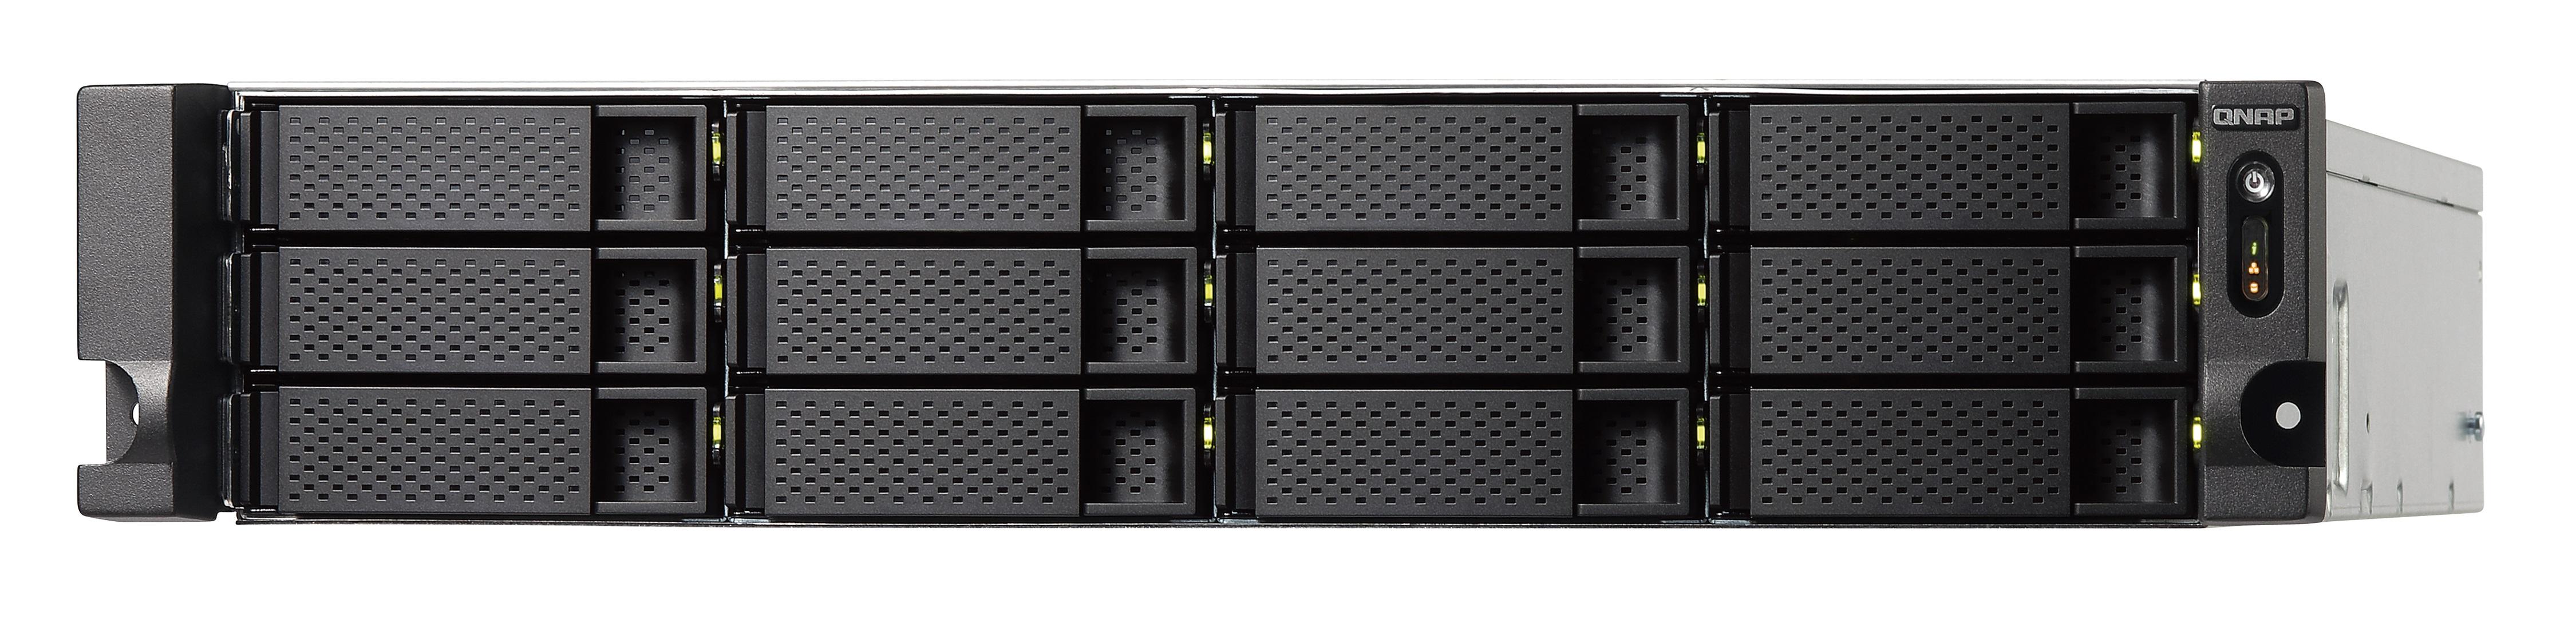 QNAP TS-1231XU-RP (1,7GHz/4GB/12xSATA/10GbE SFP+)